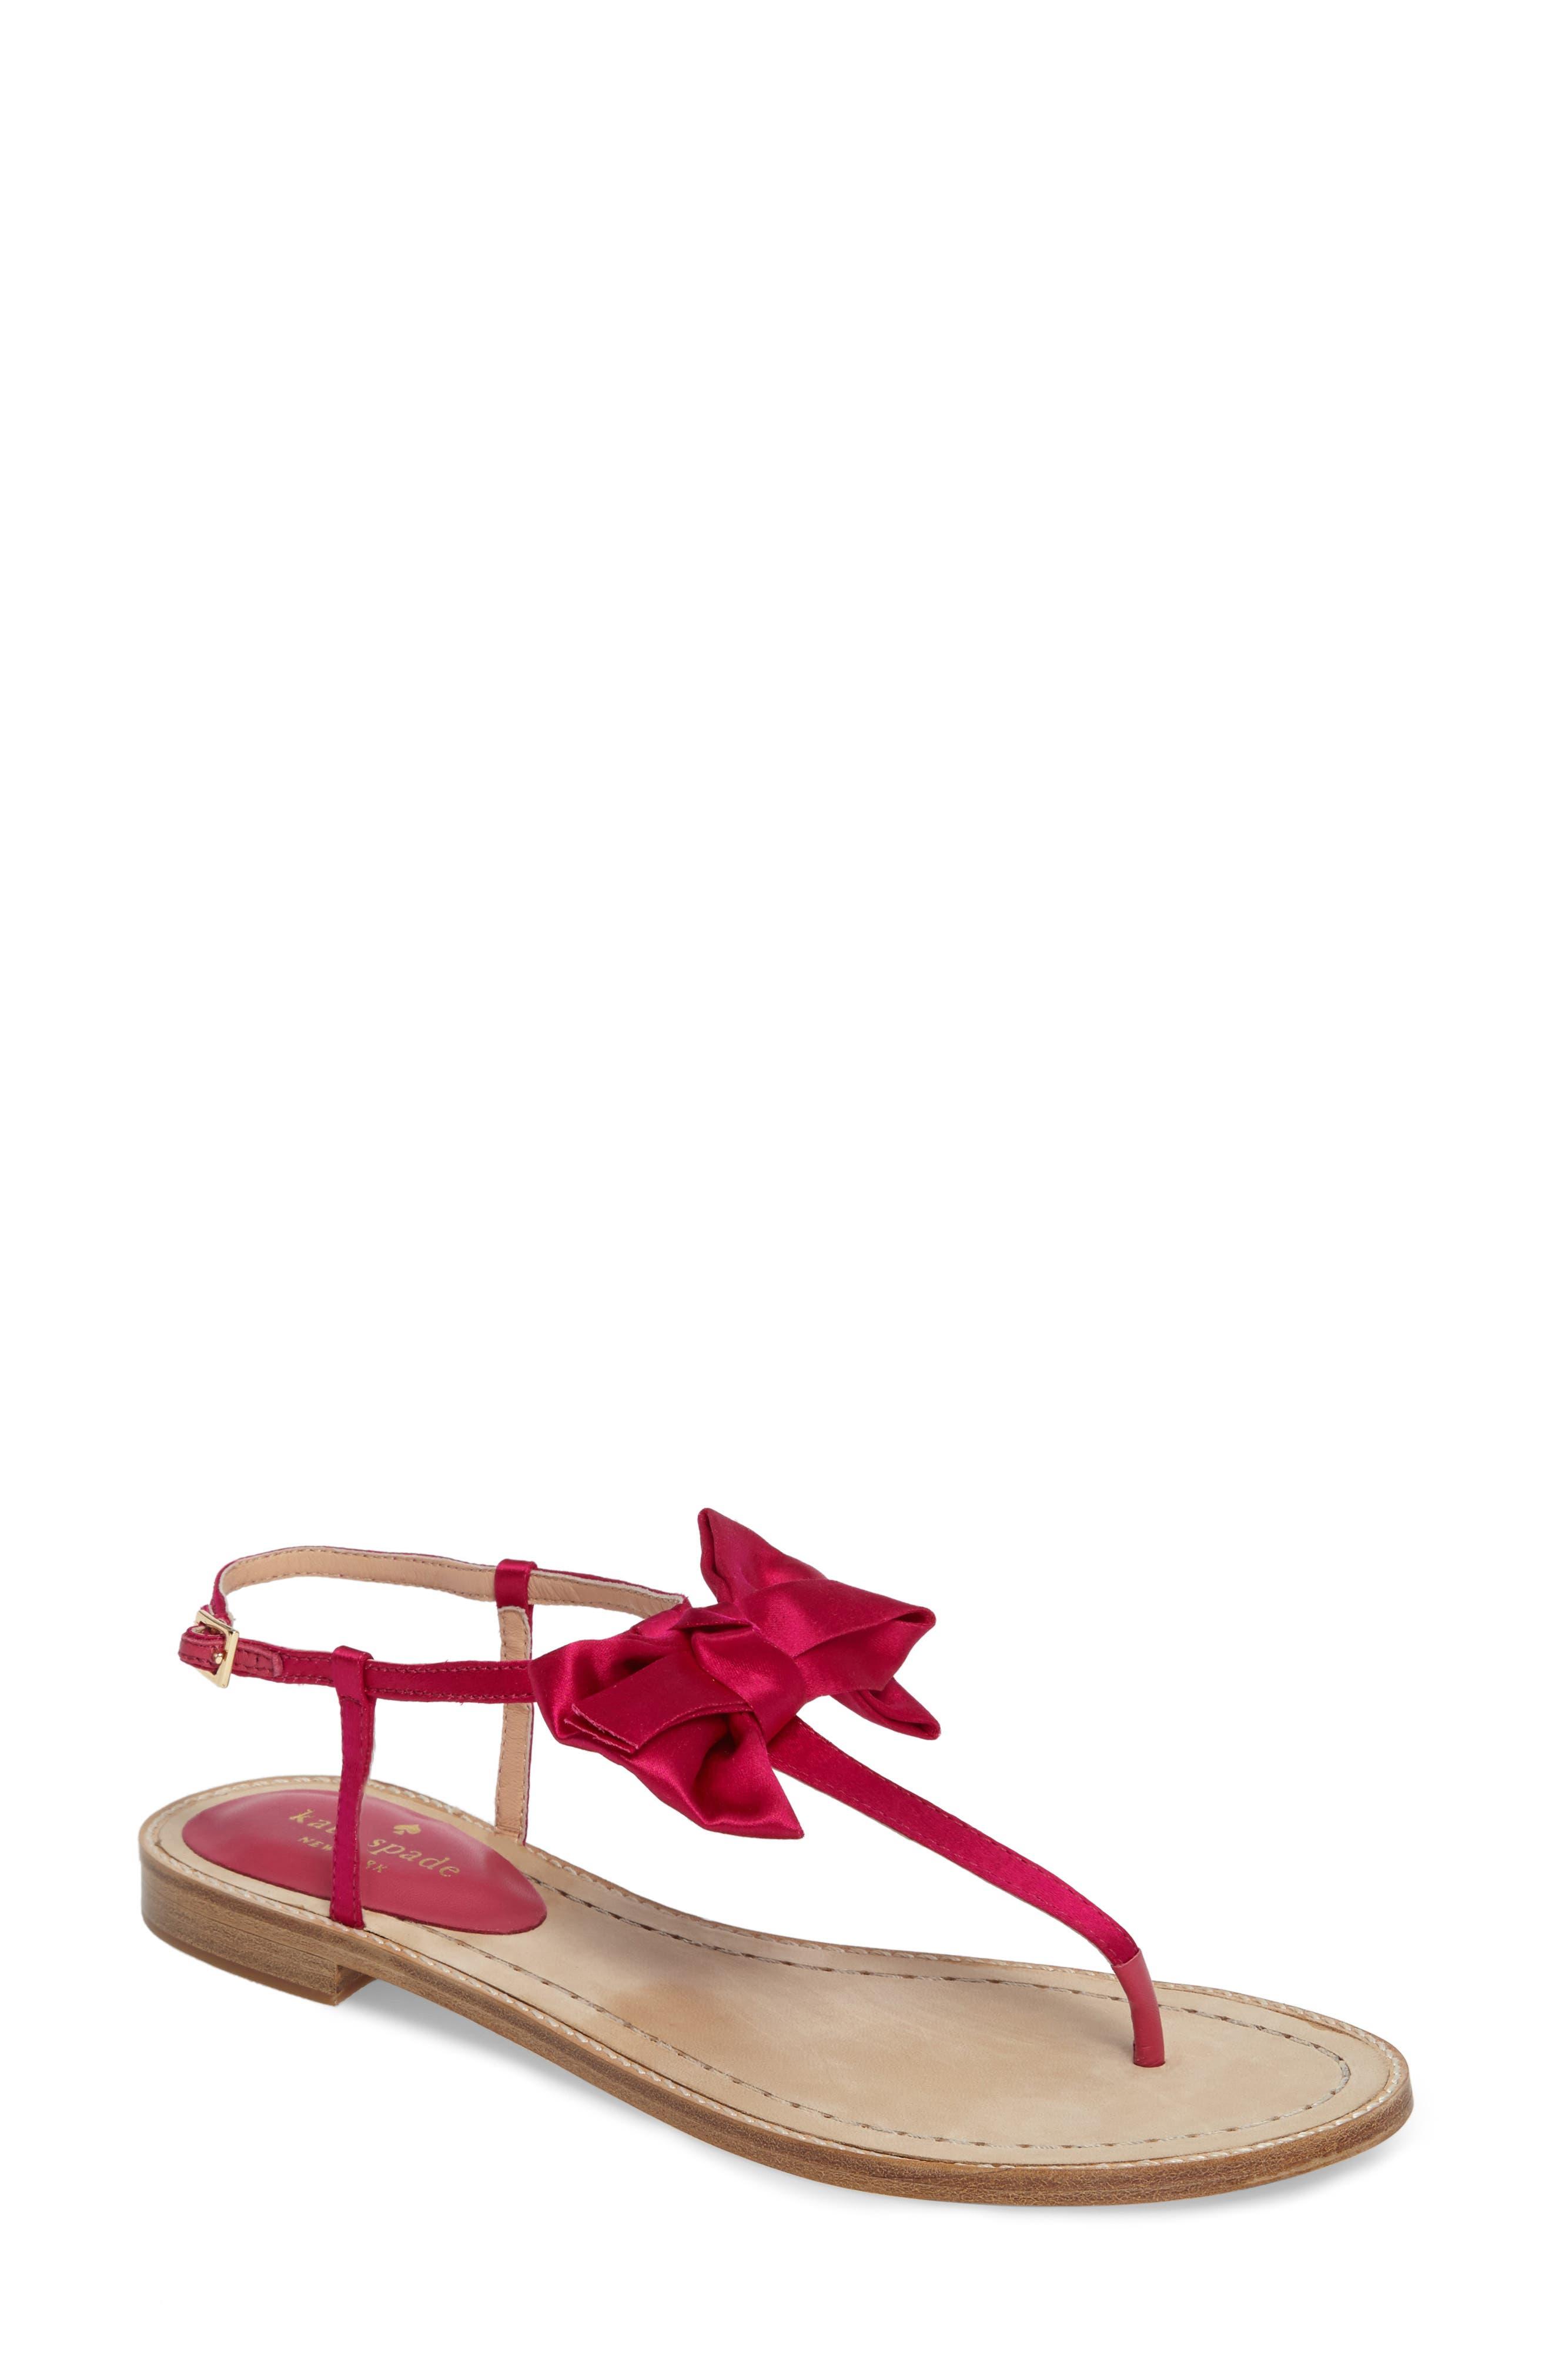 kate spade new york serrano bow sandal (Women)